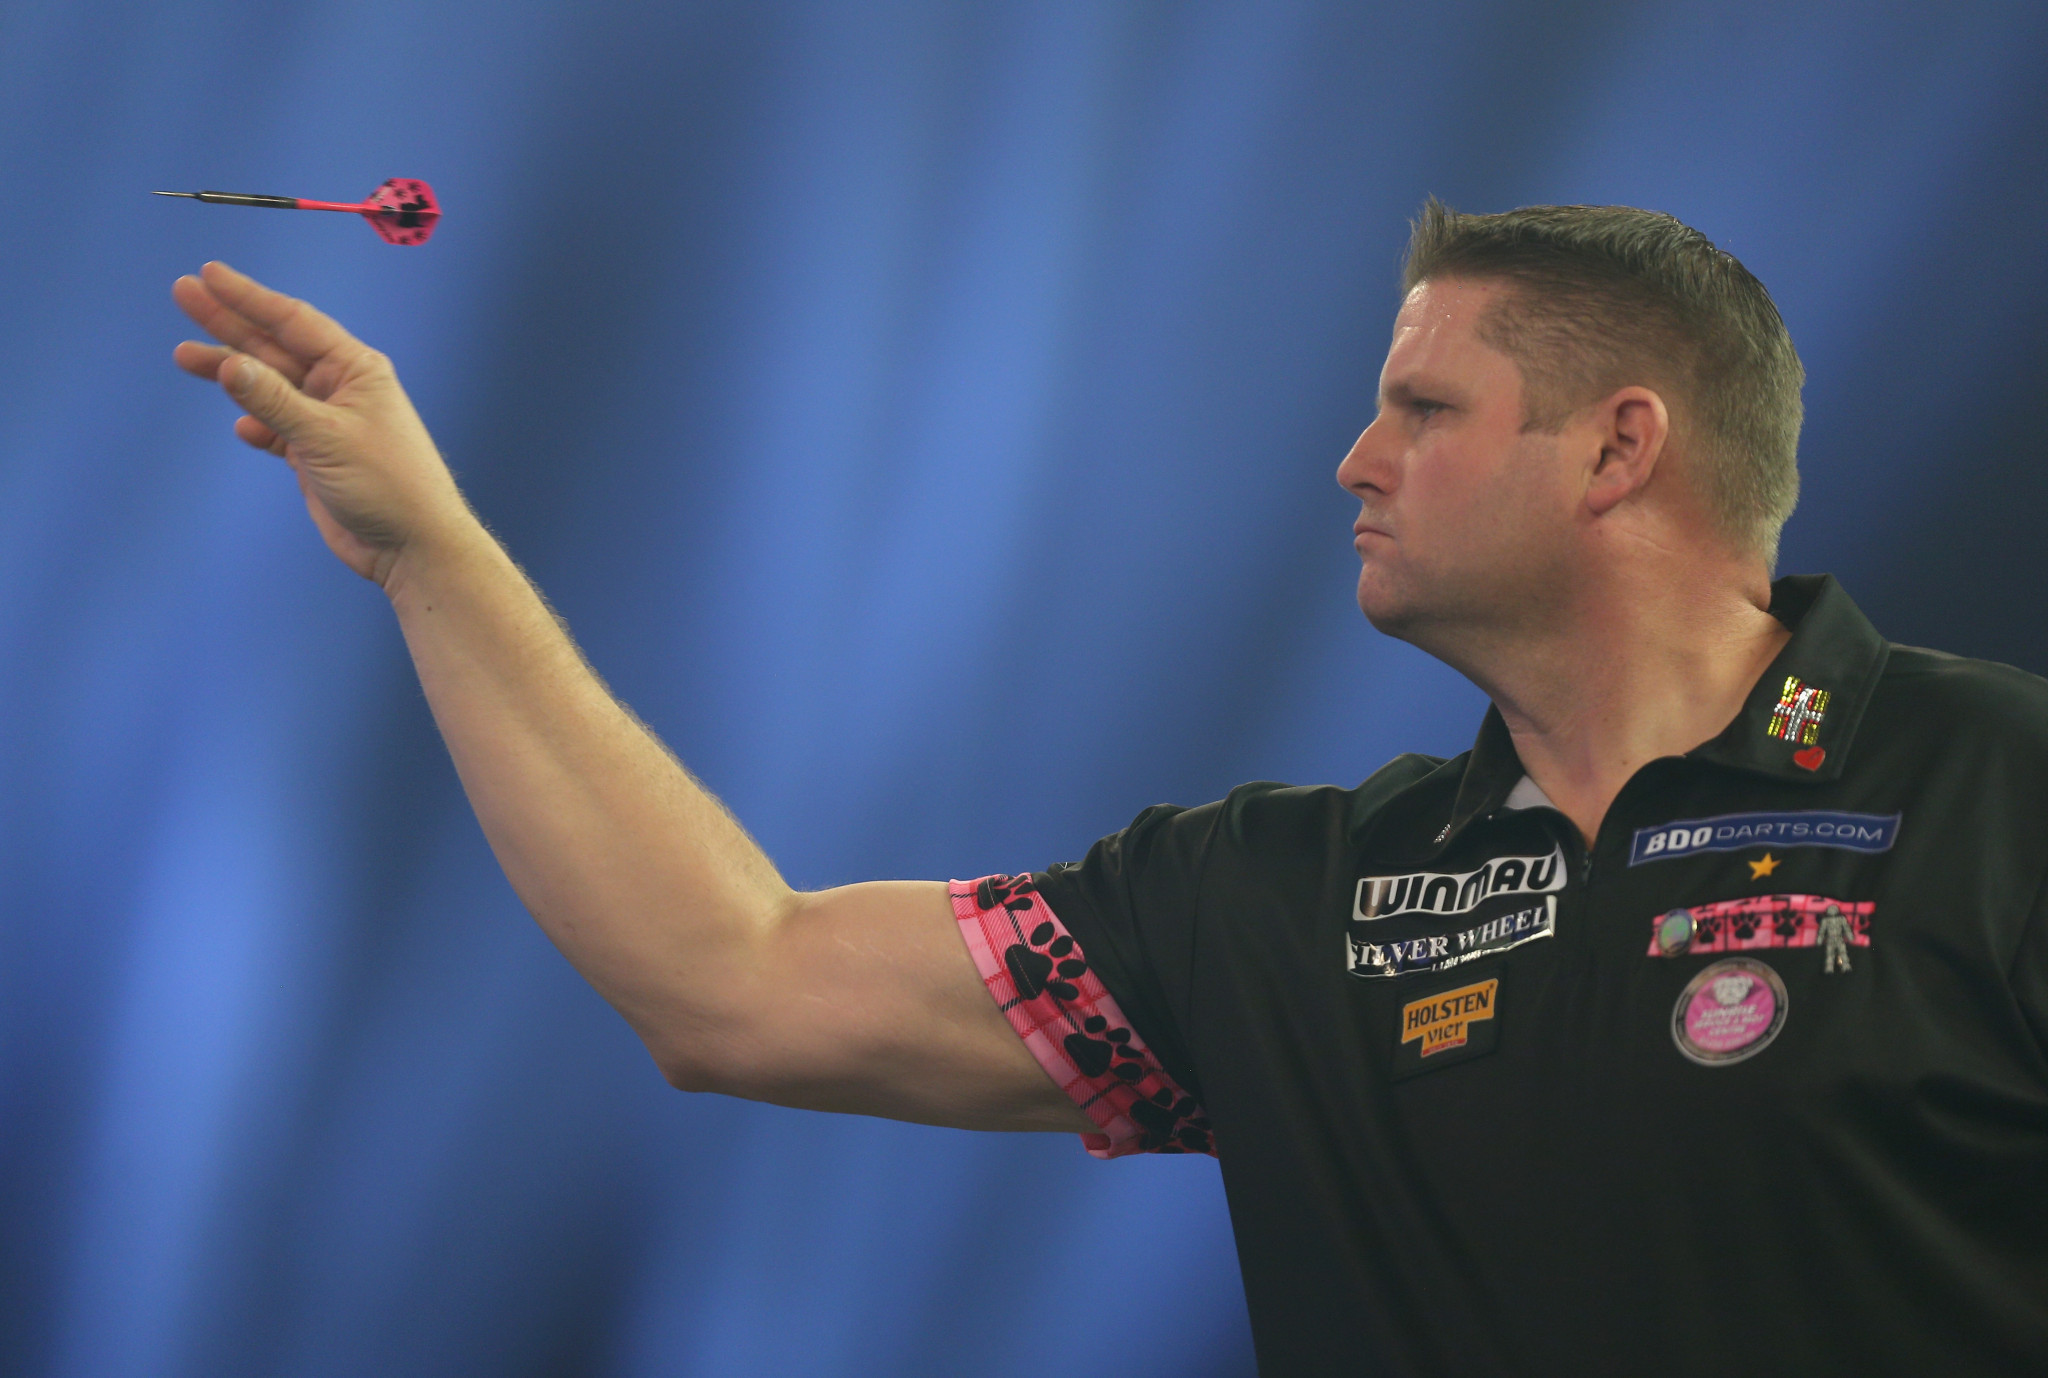 Mitchell suffers second round loss at BDO World Championships